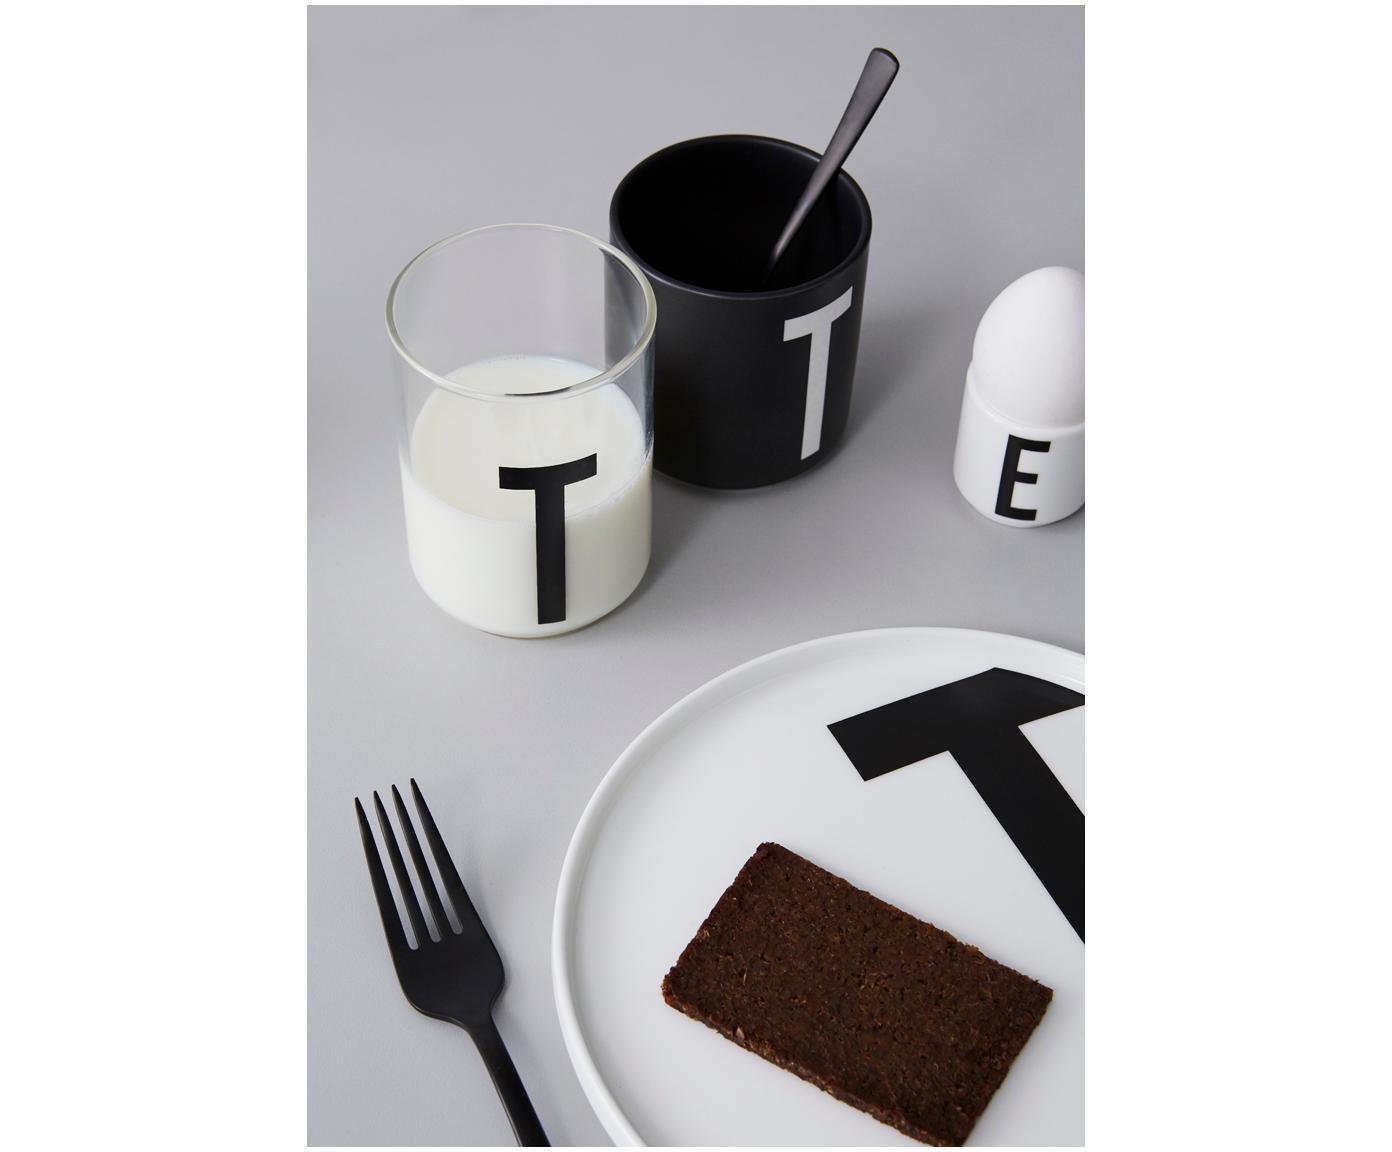 Waterglas Personal met designletters (varianten van A tot Z), Borosilicaatglas, Transparant, zwart, Waterglas A